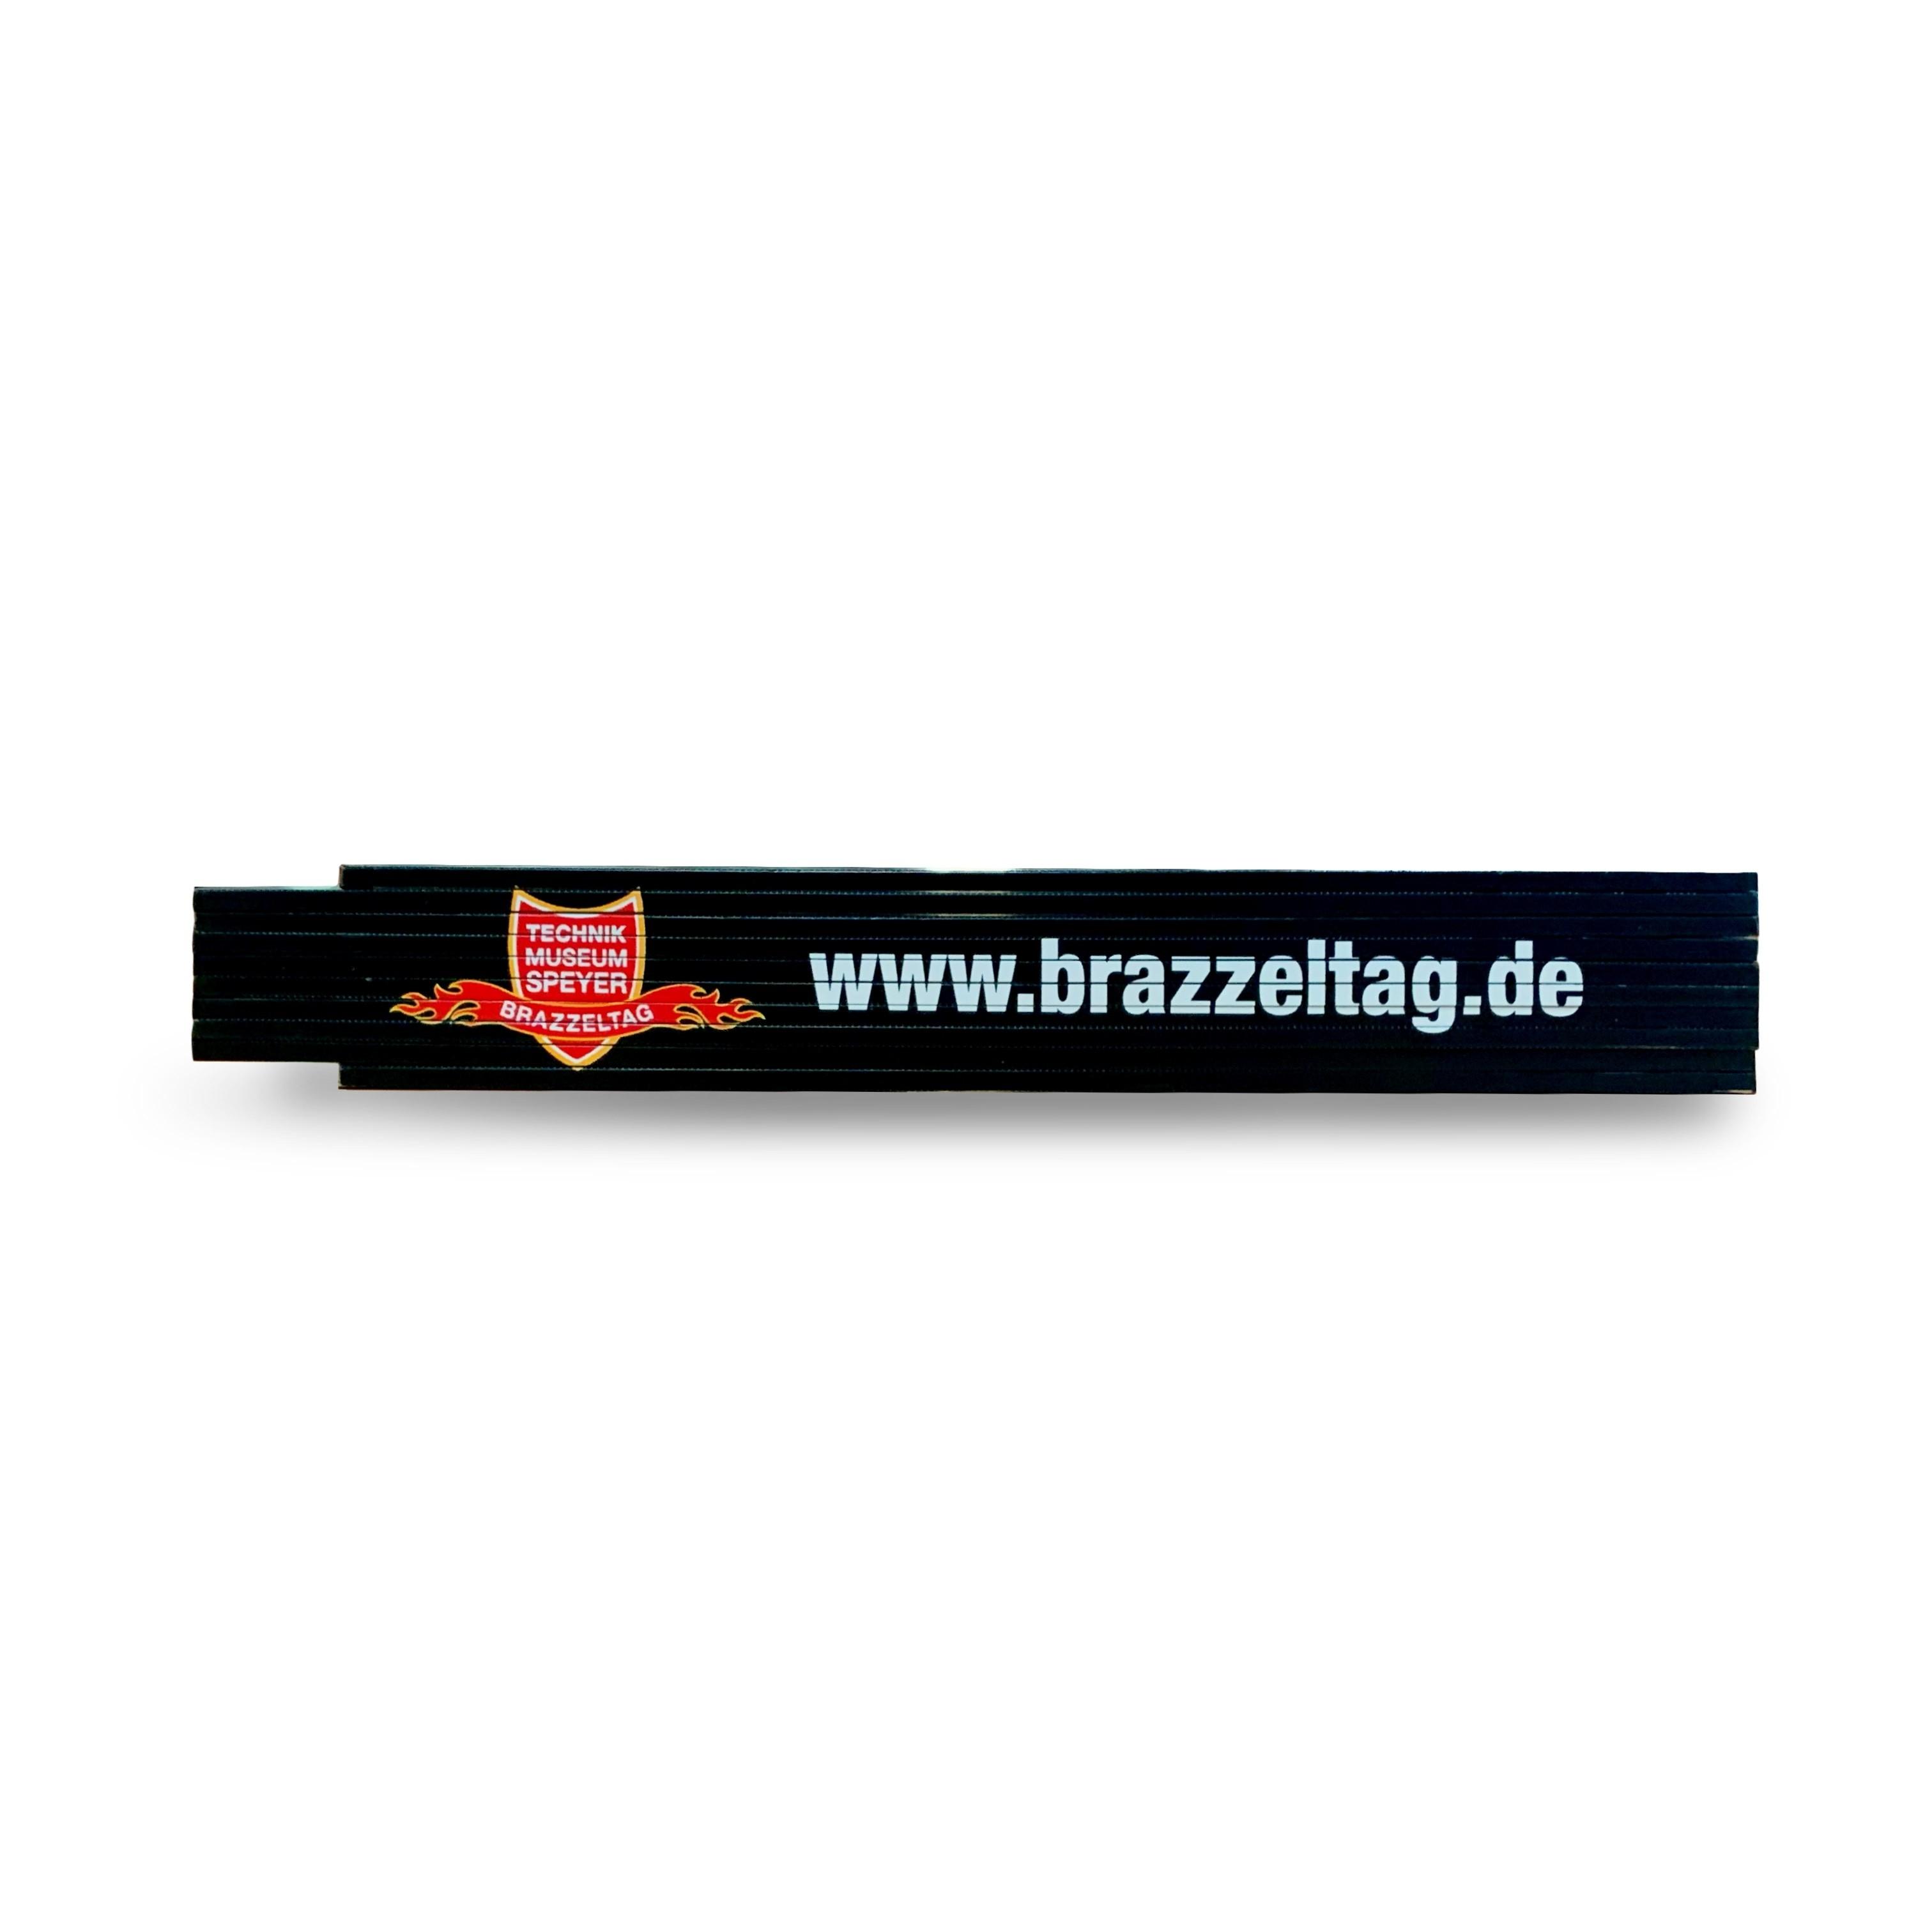 Brazzeltag - measuring stick